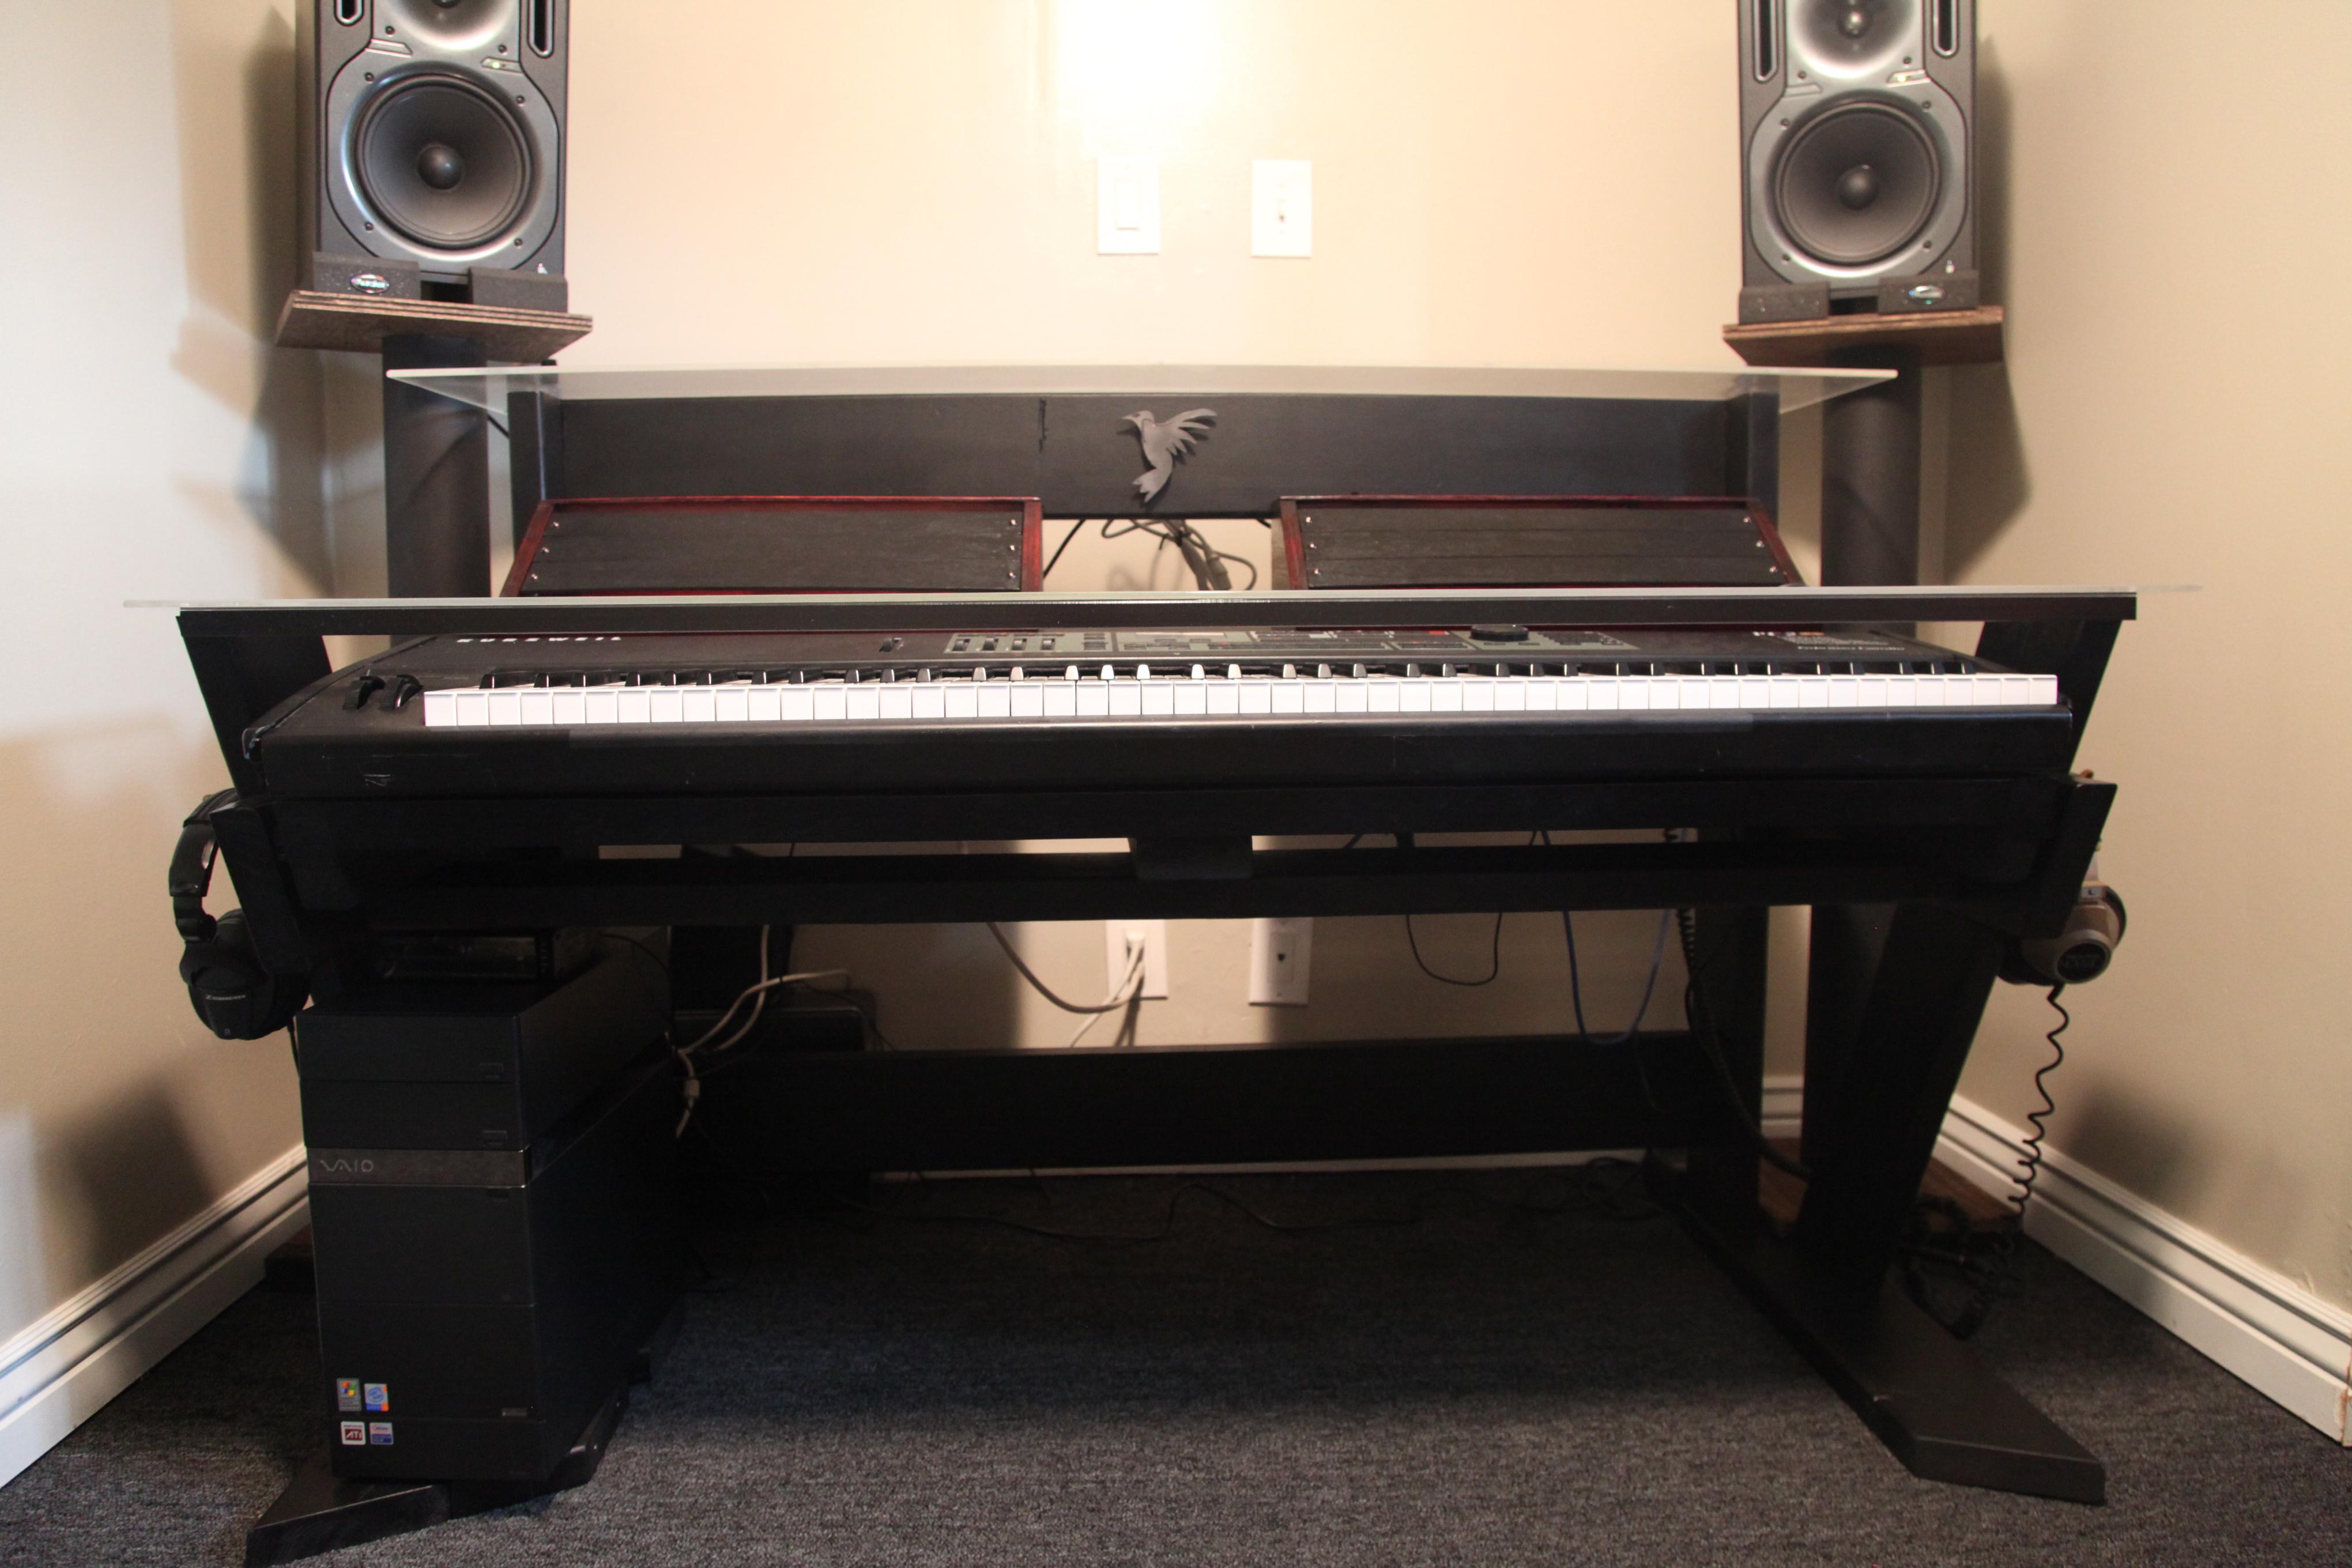 diy studio desk keyboard workstation under 100 page 2 gearslutz pro audio community. Black Bedroom Furniture Sets. Home Design Ideas